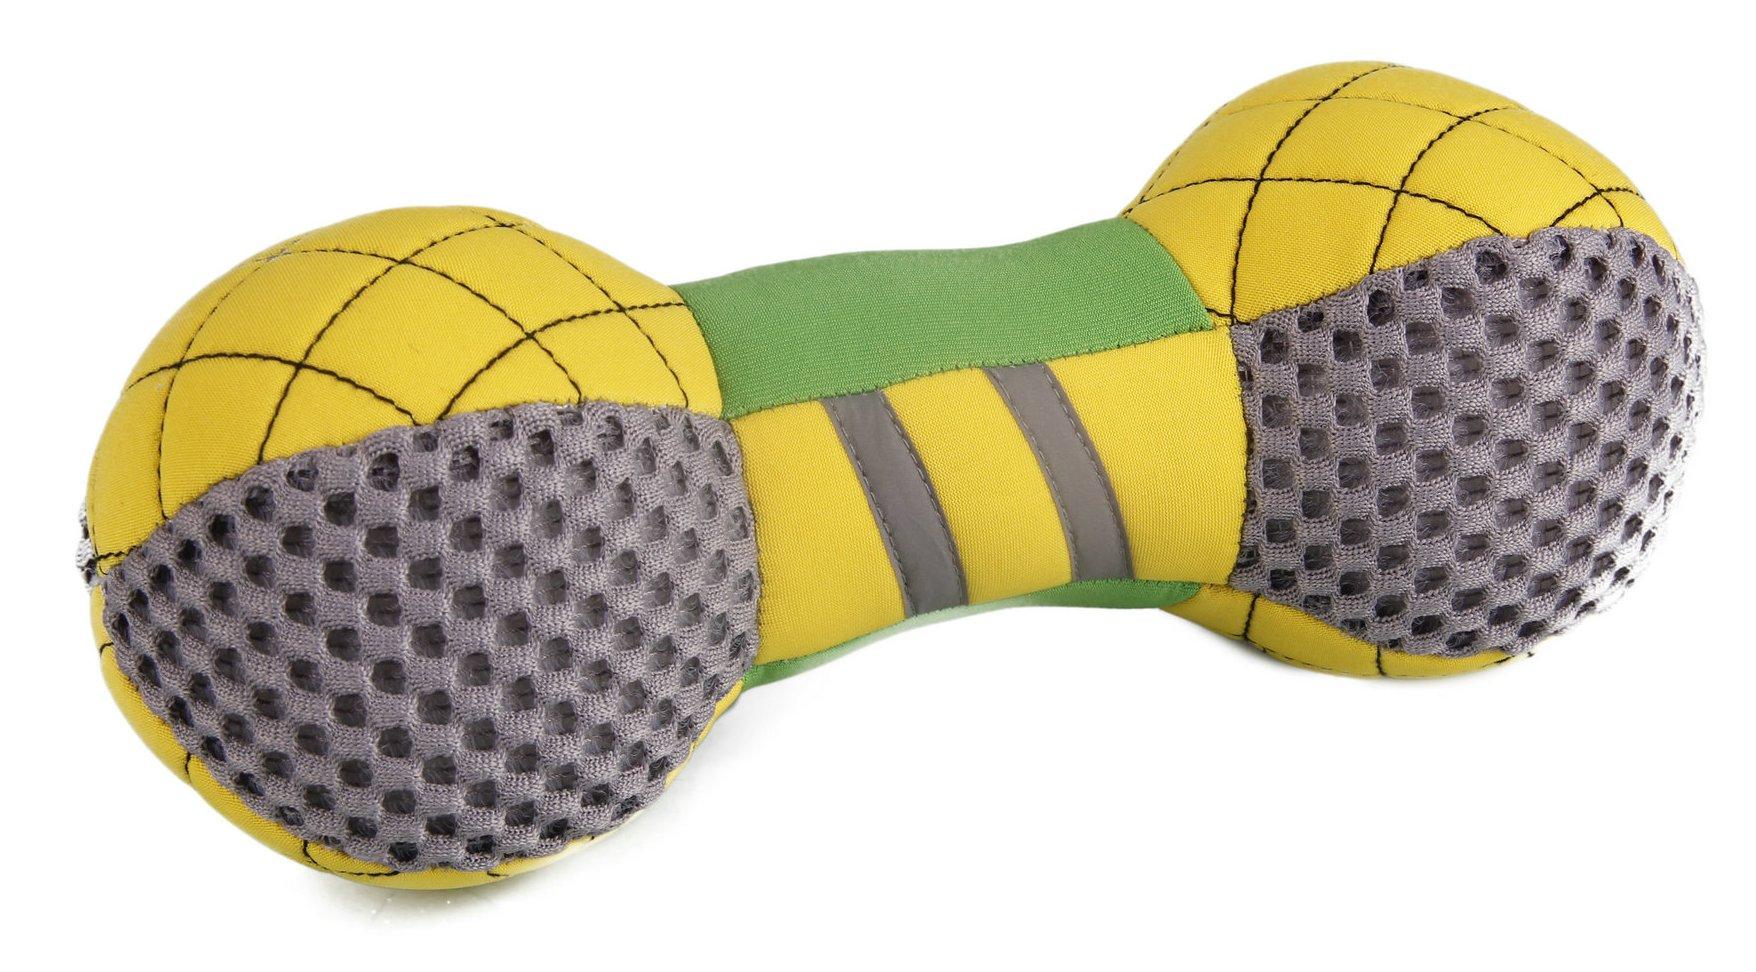 PET LIFE Pet Toys Bark-Active Neoprene Mesh Flotation Bone Fetch Dog Toy DT12YLGN